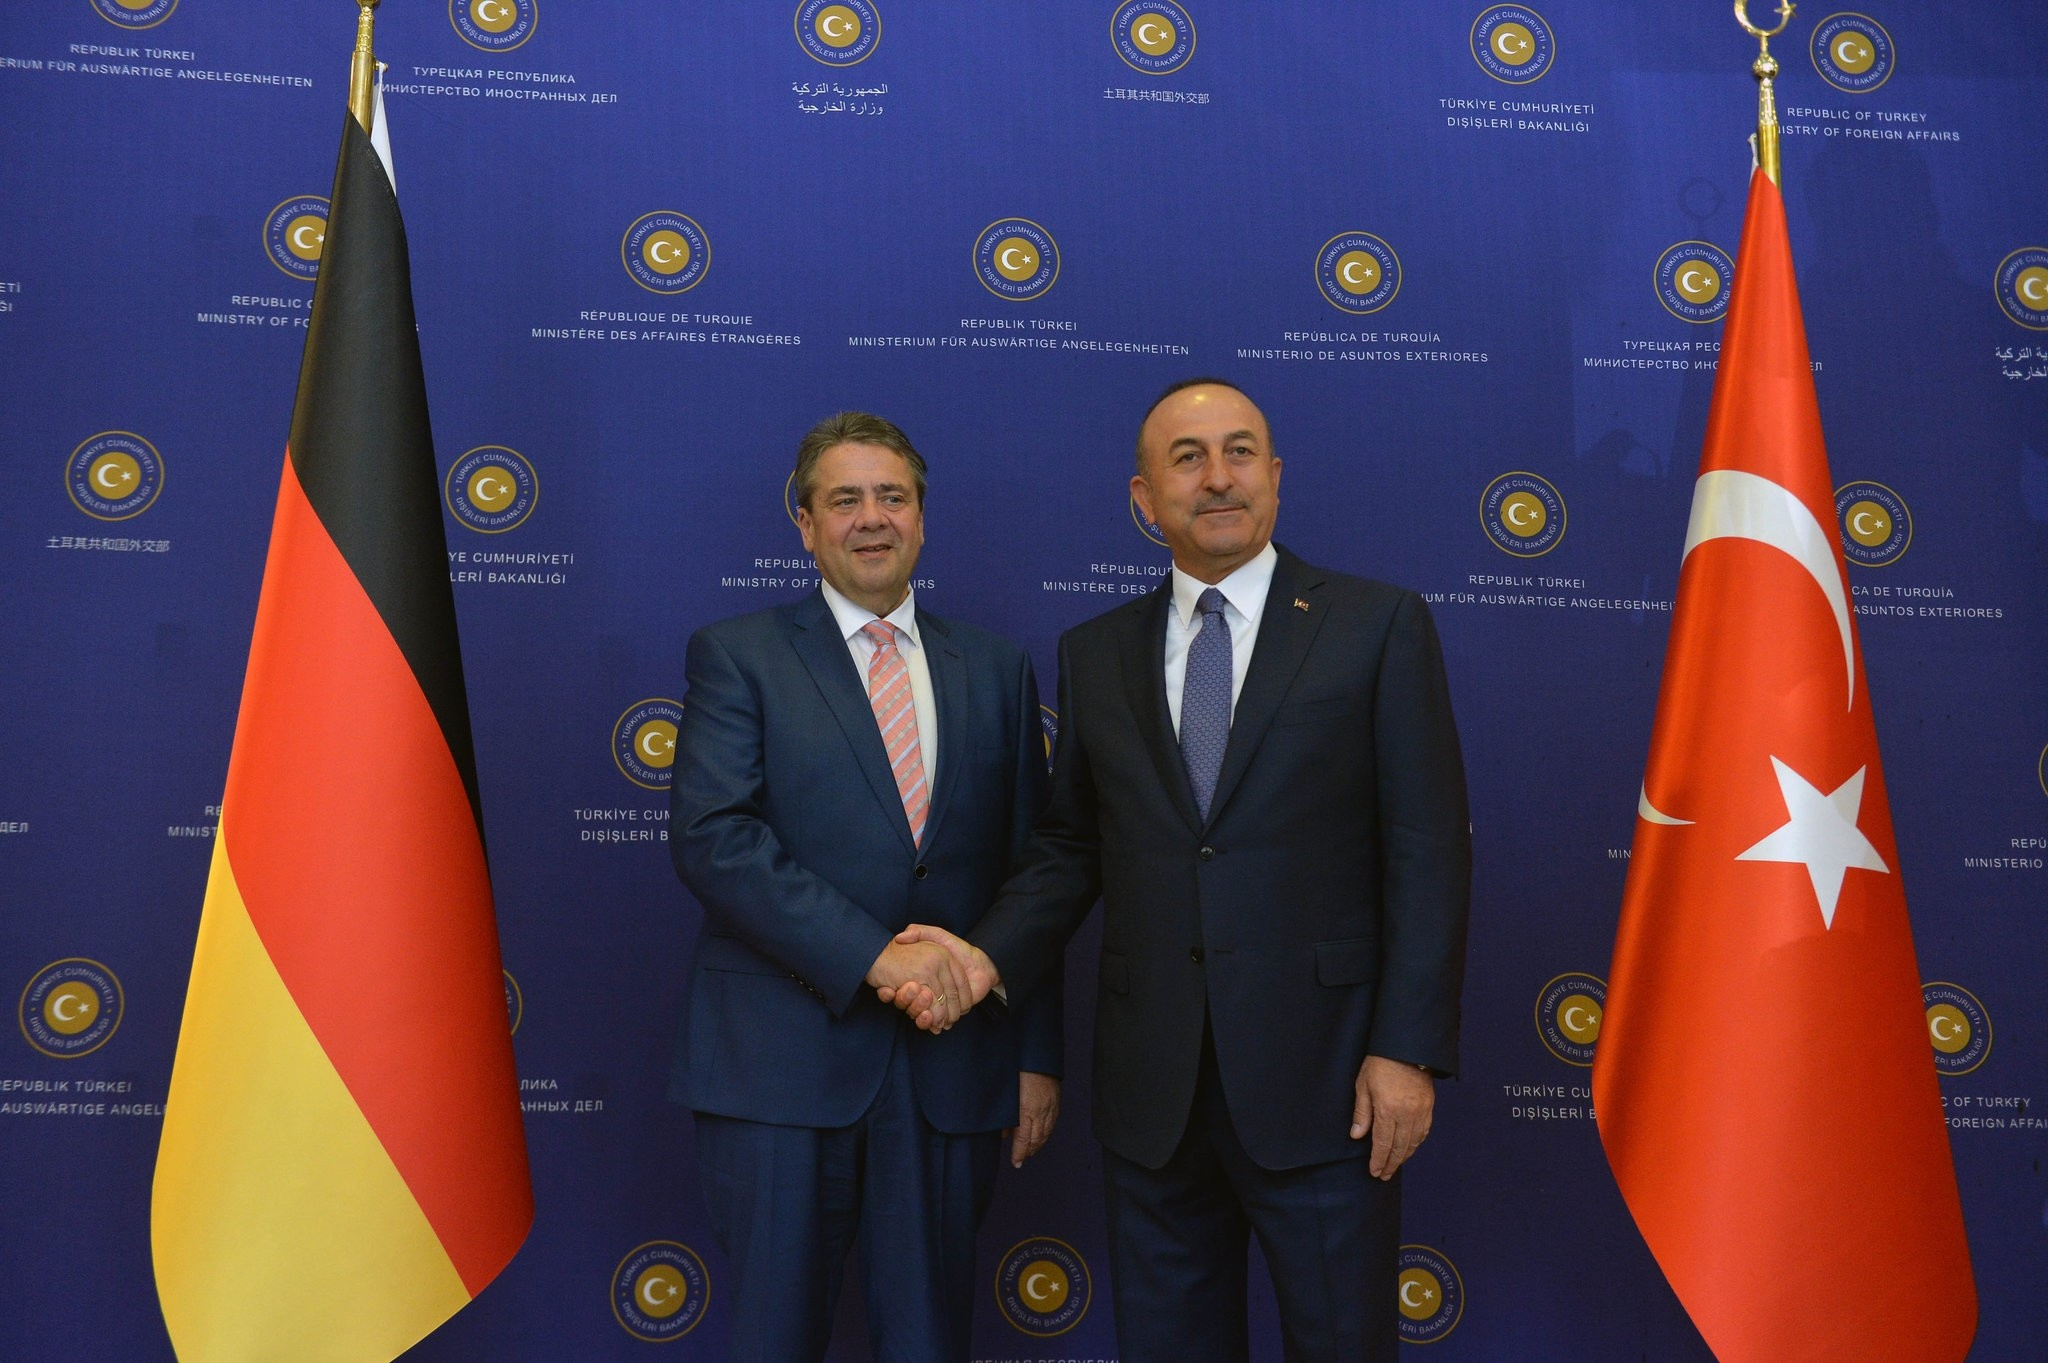 German FM Sigmar Gabriel (L) and Turkish FM Mevlu00fct u00c7avuu015fou011flu pose for photos after holding a joint press conference in Ankara, June 5, 2017. (FILE Photo)